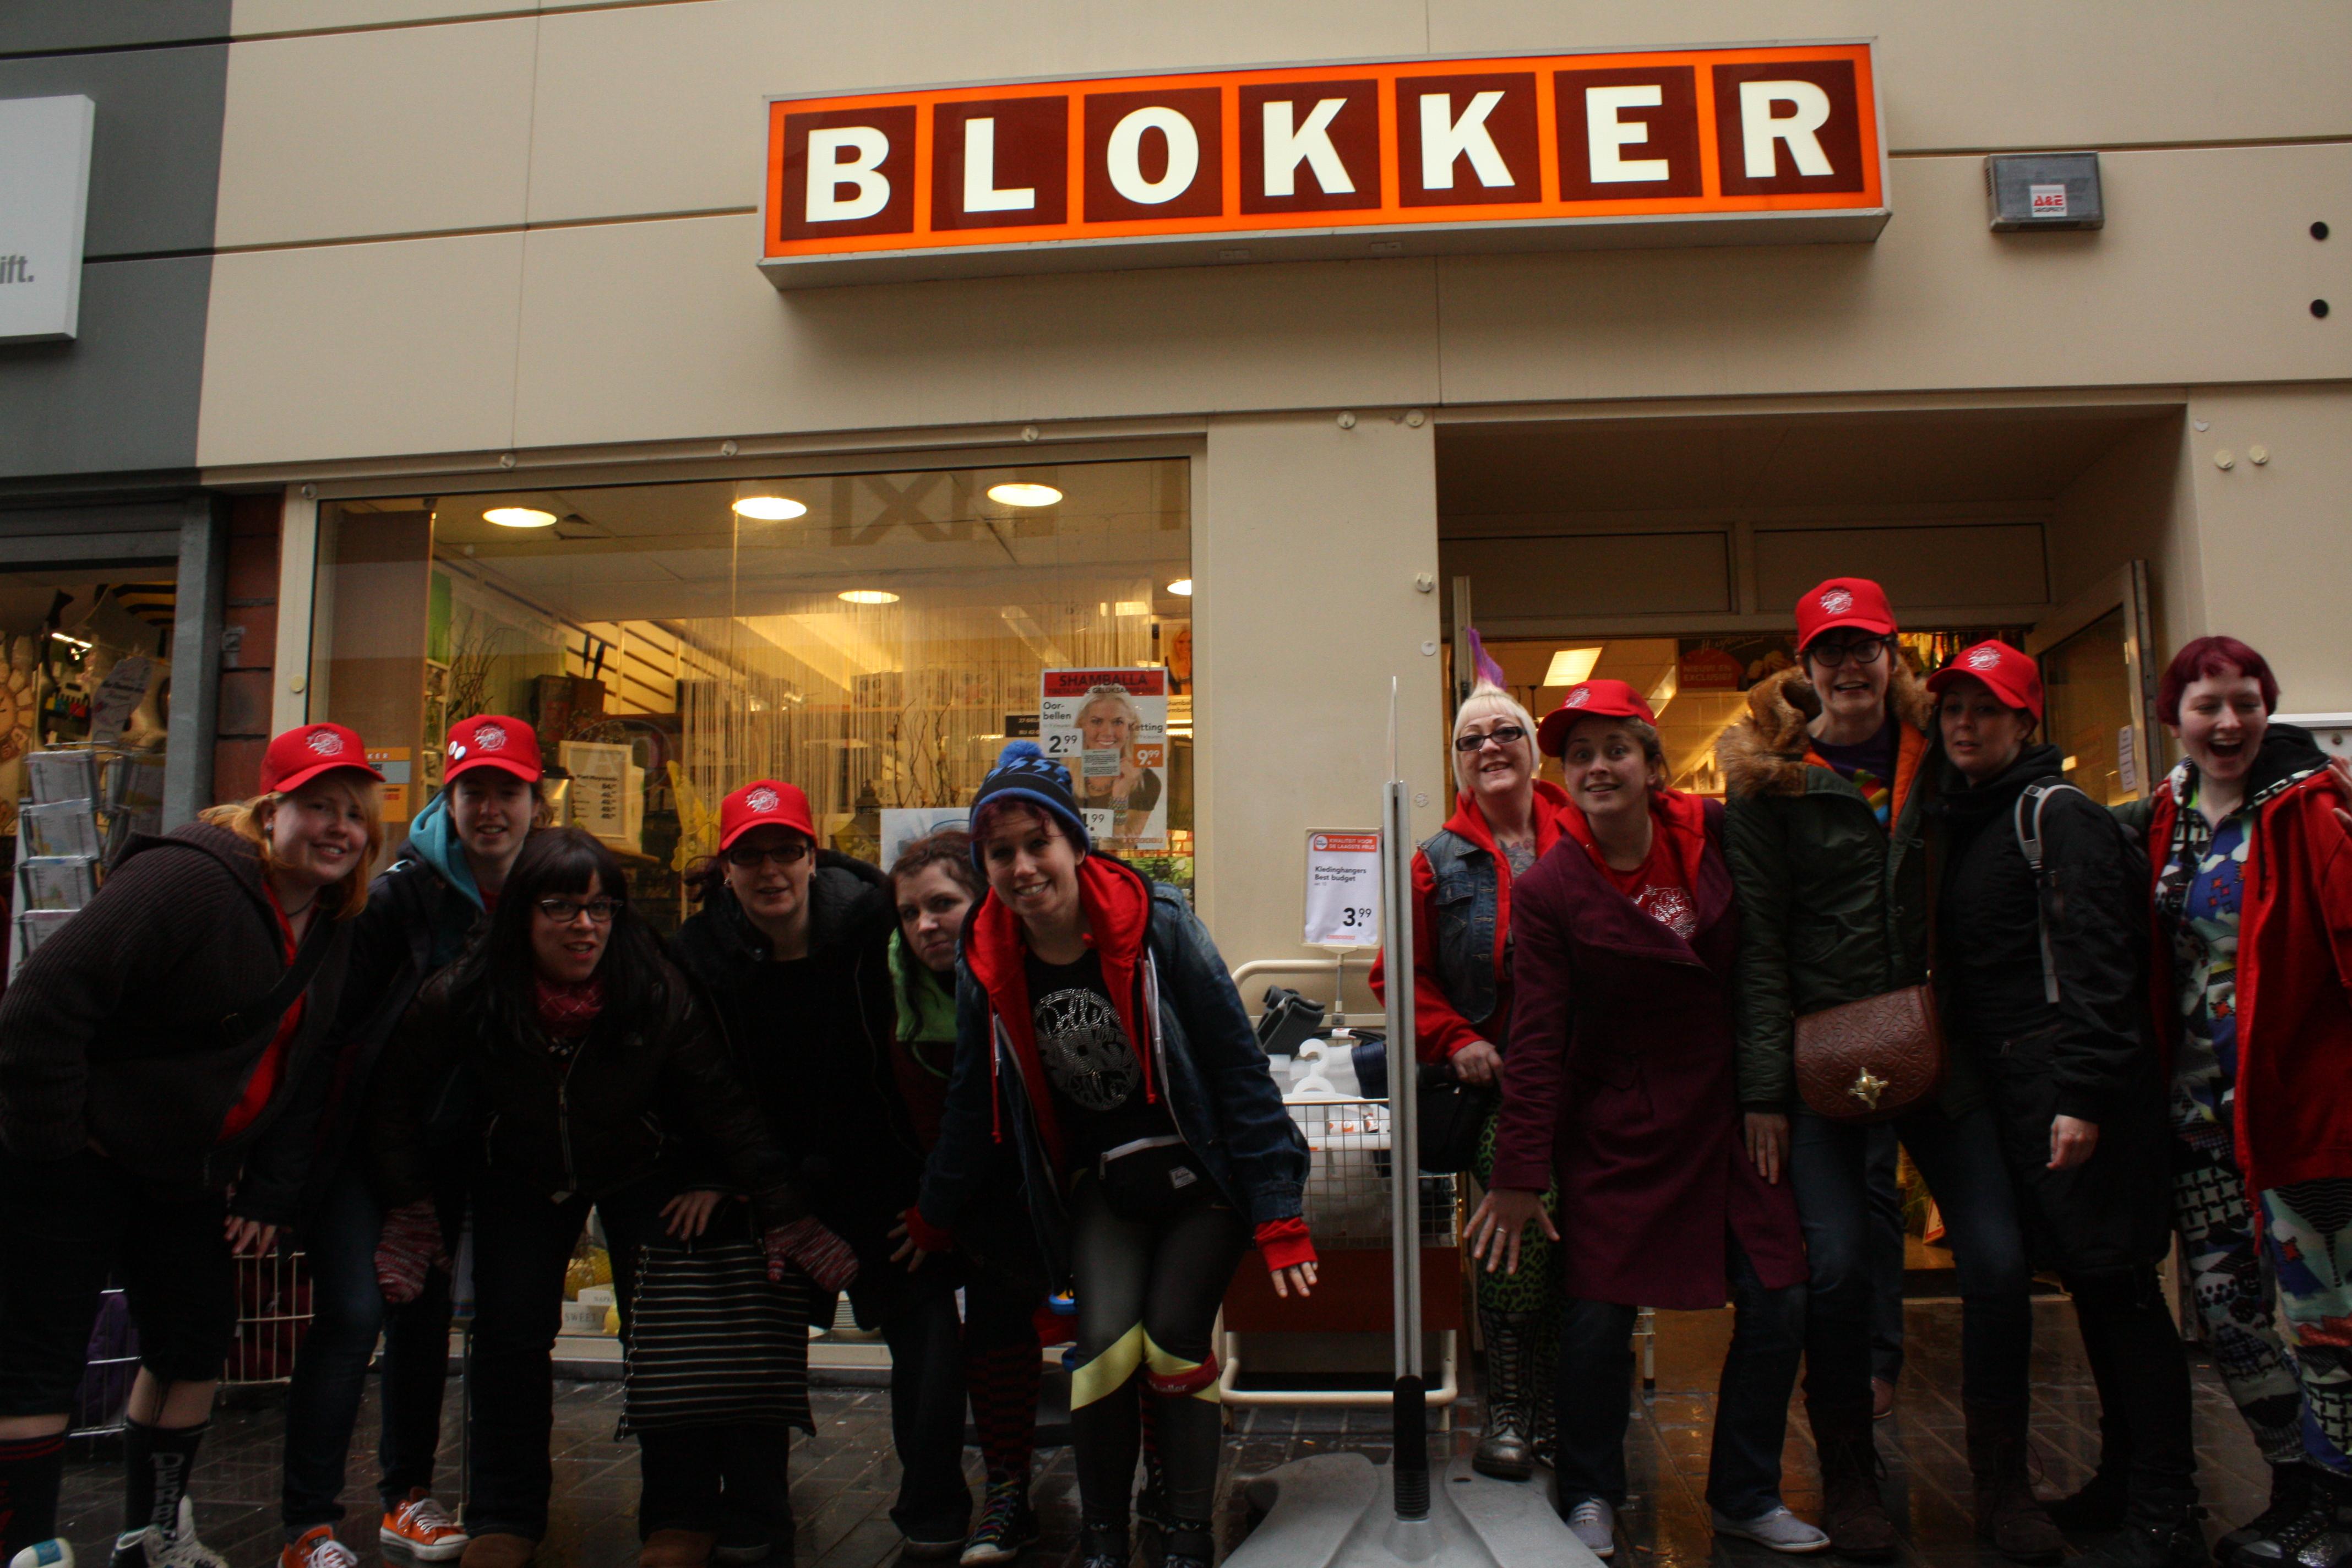 Blokkers!